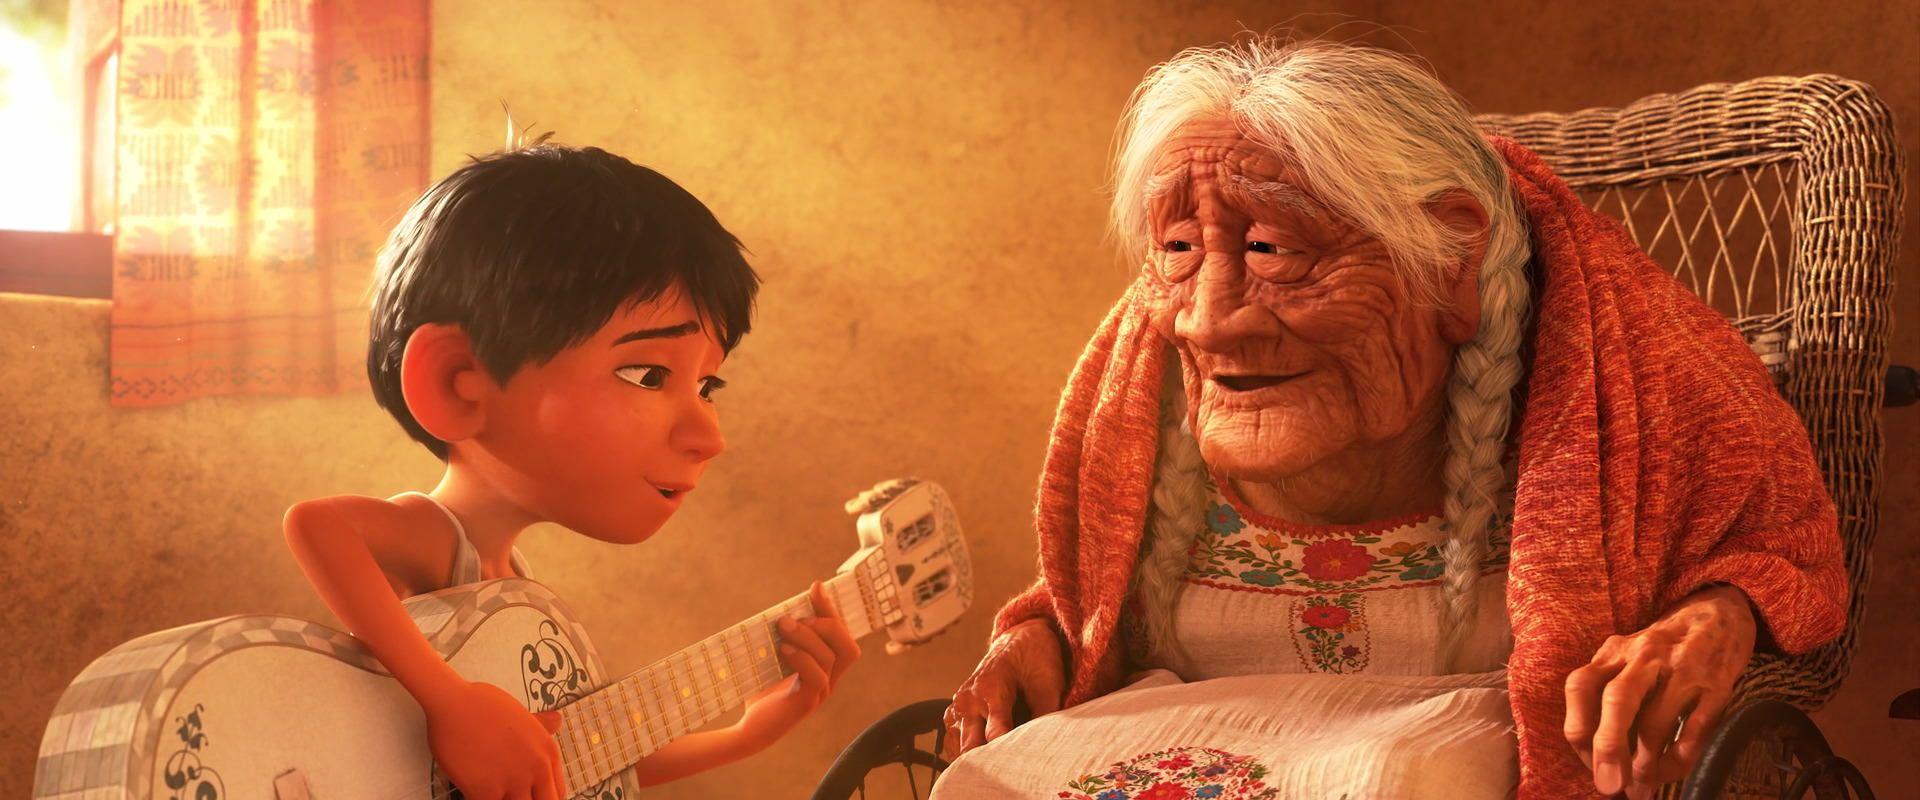 Pixars Coco från 2017